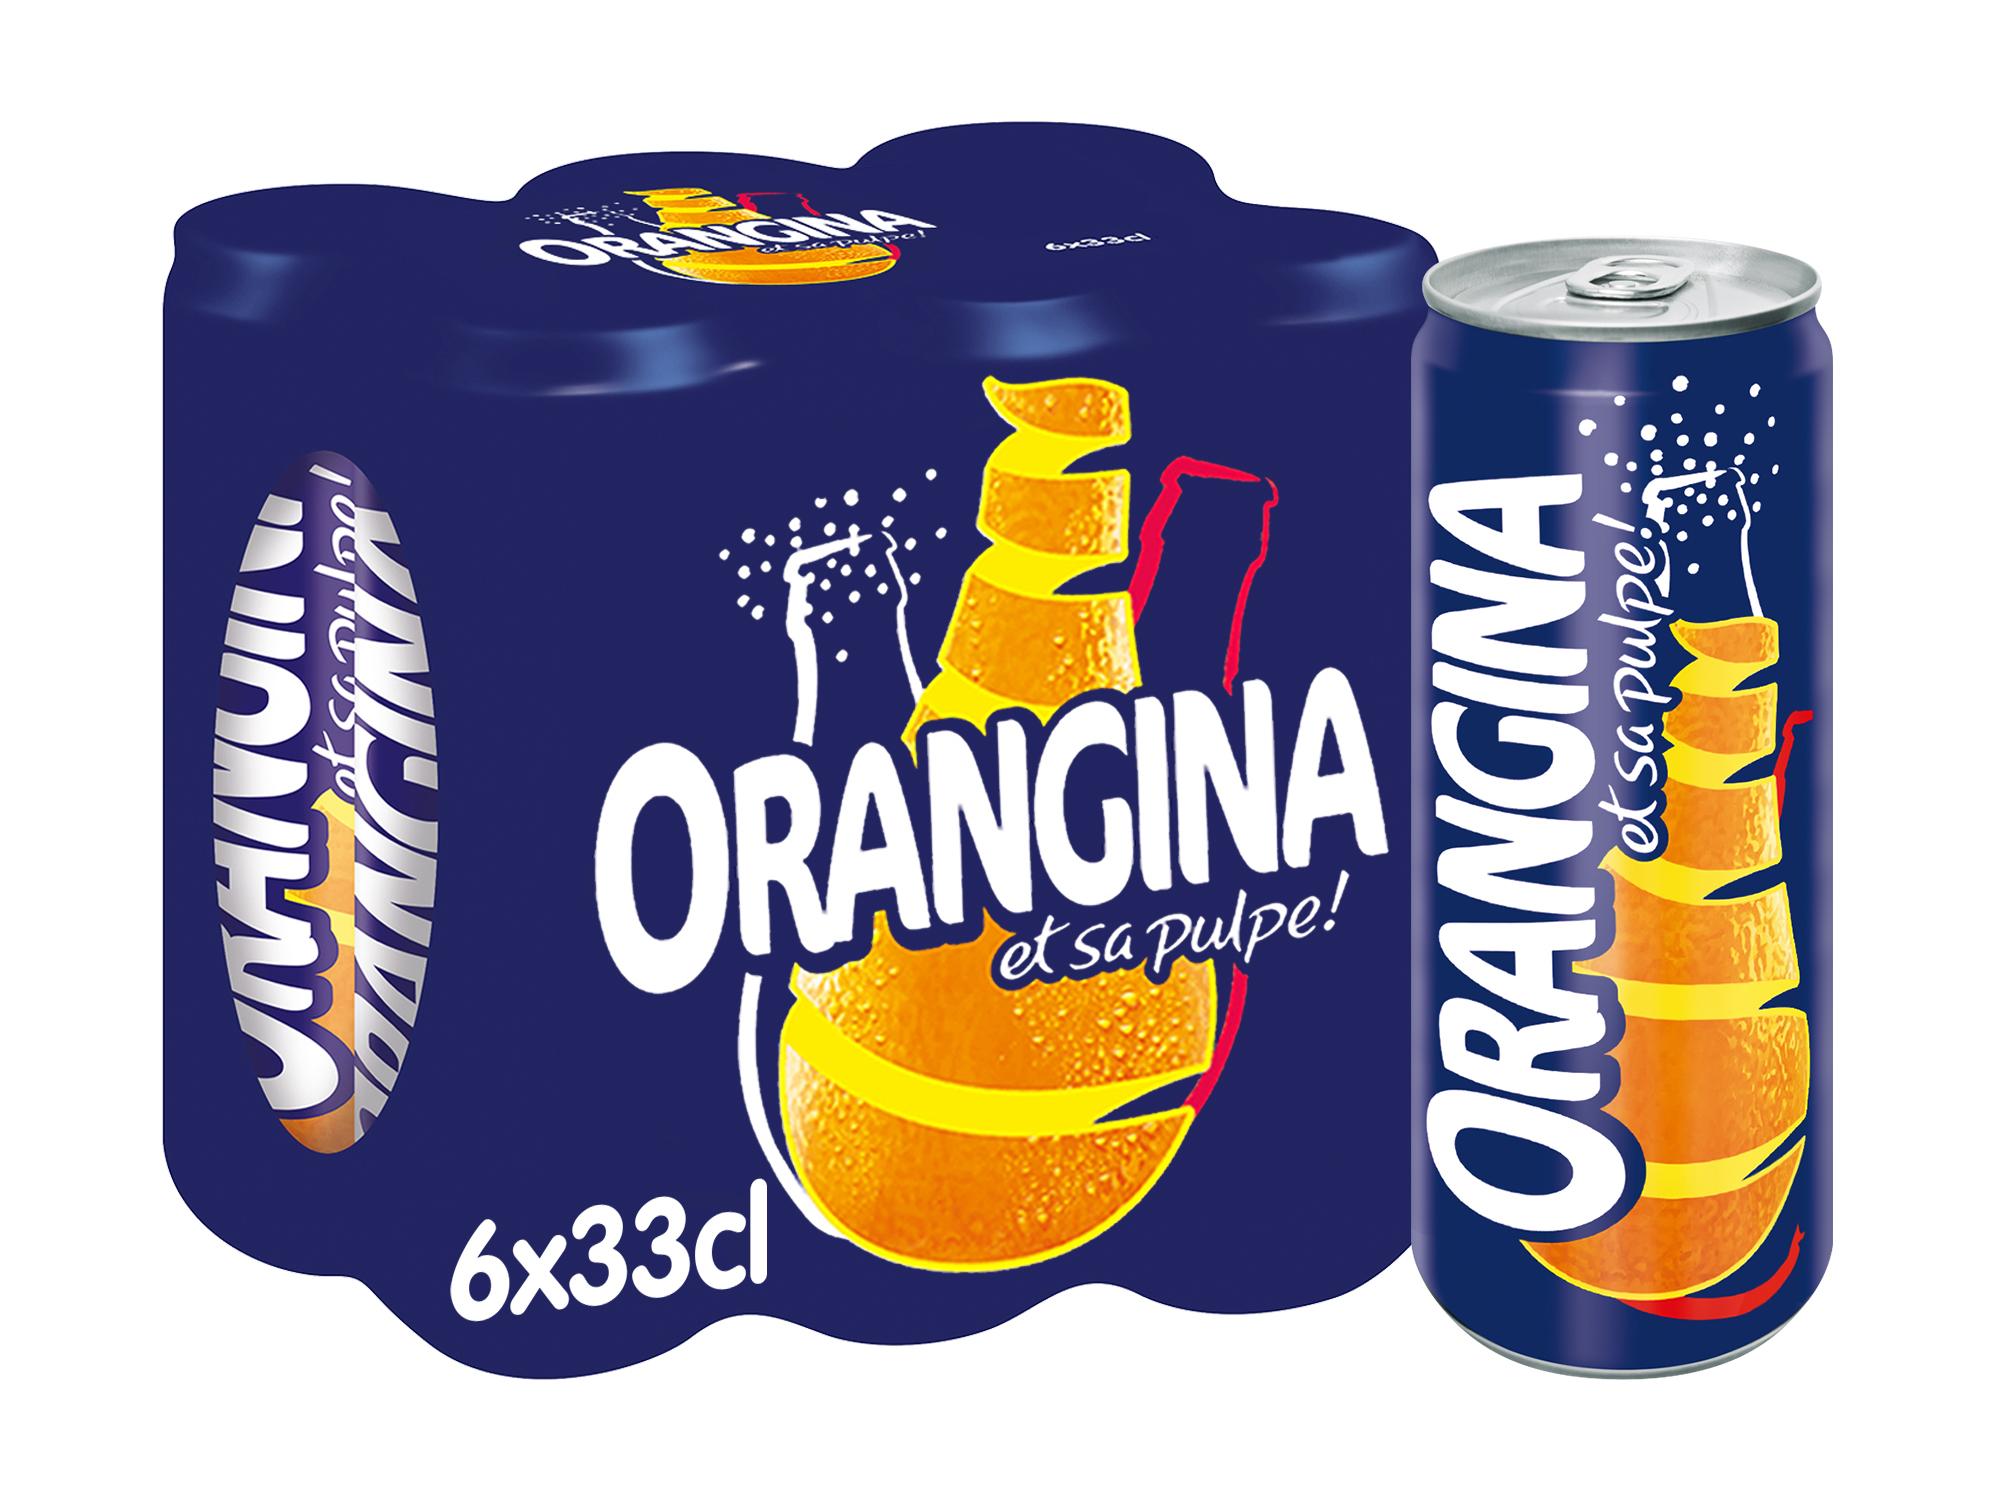 Orangina (6 x 33 cl)